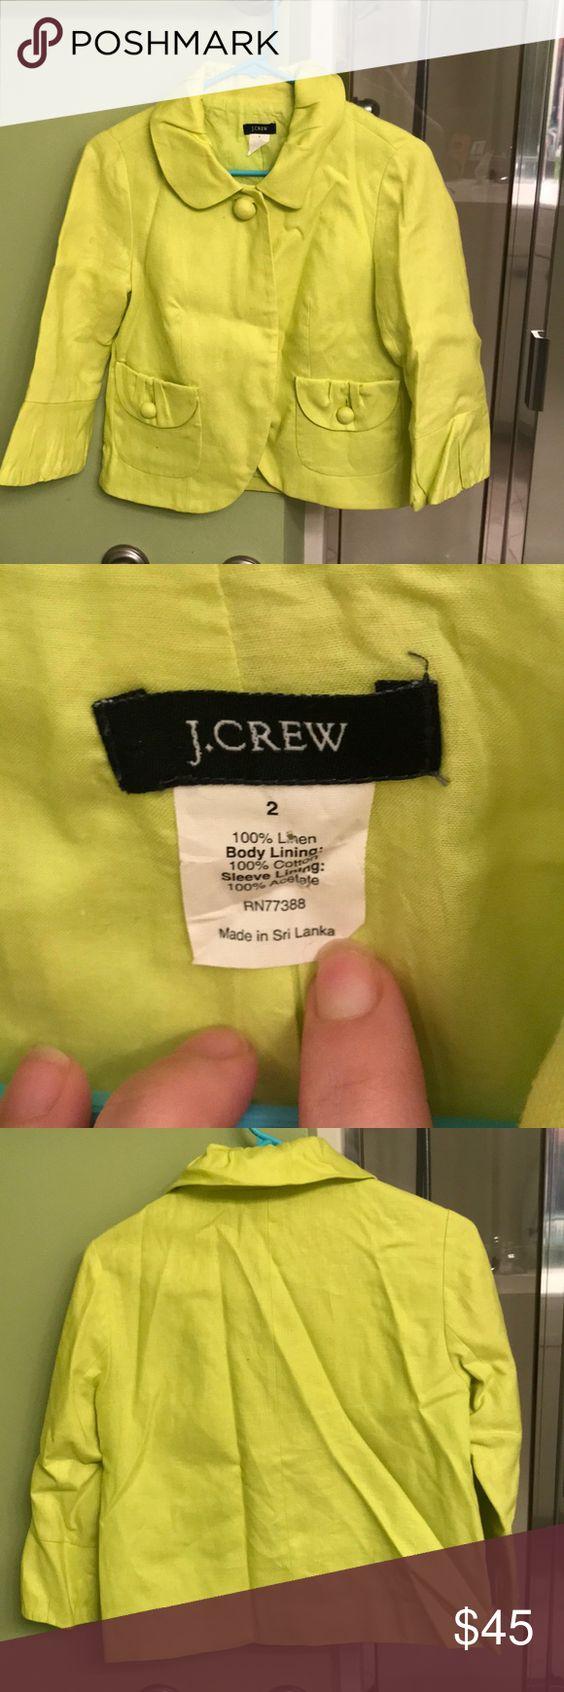 J Crew Jacket J Crew Jacket J Crew Clothes Design